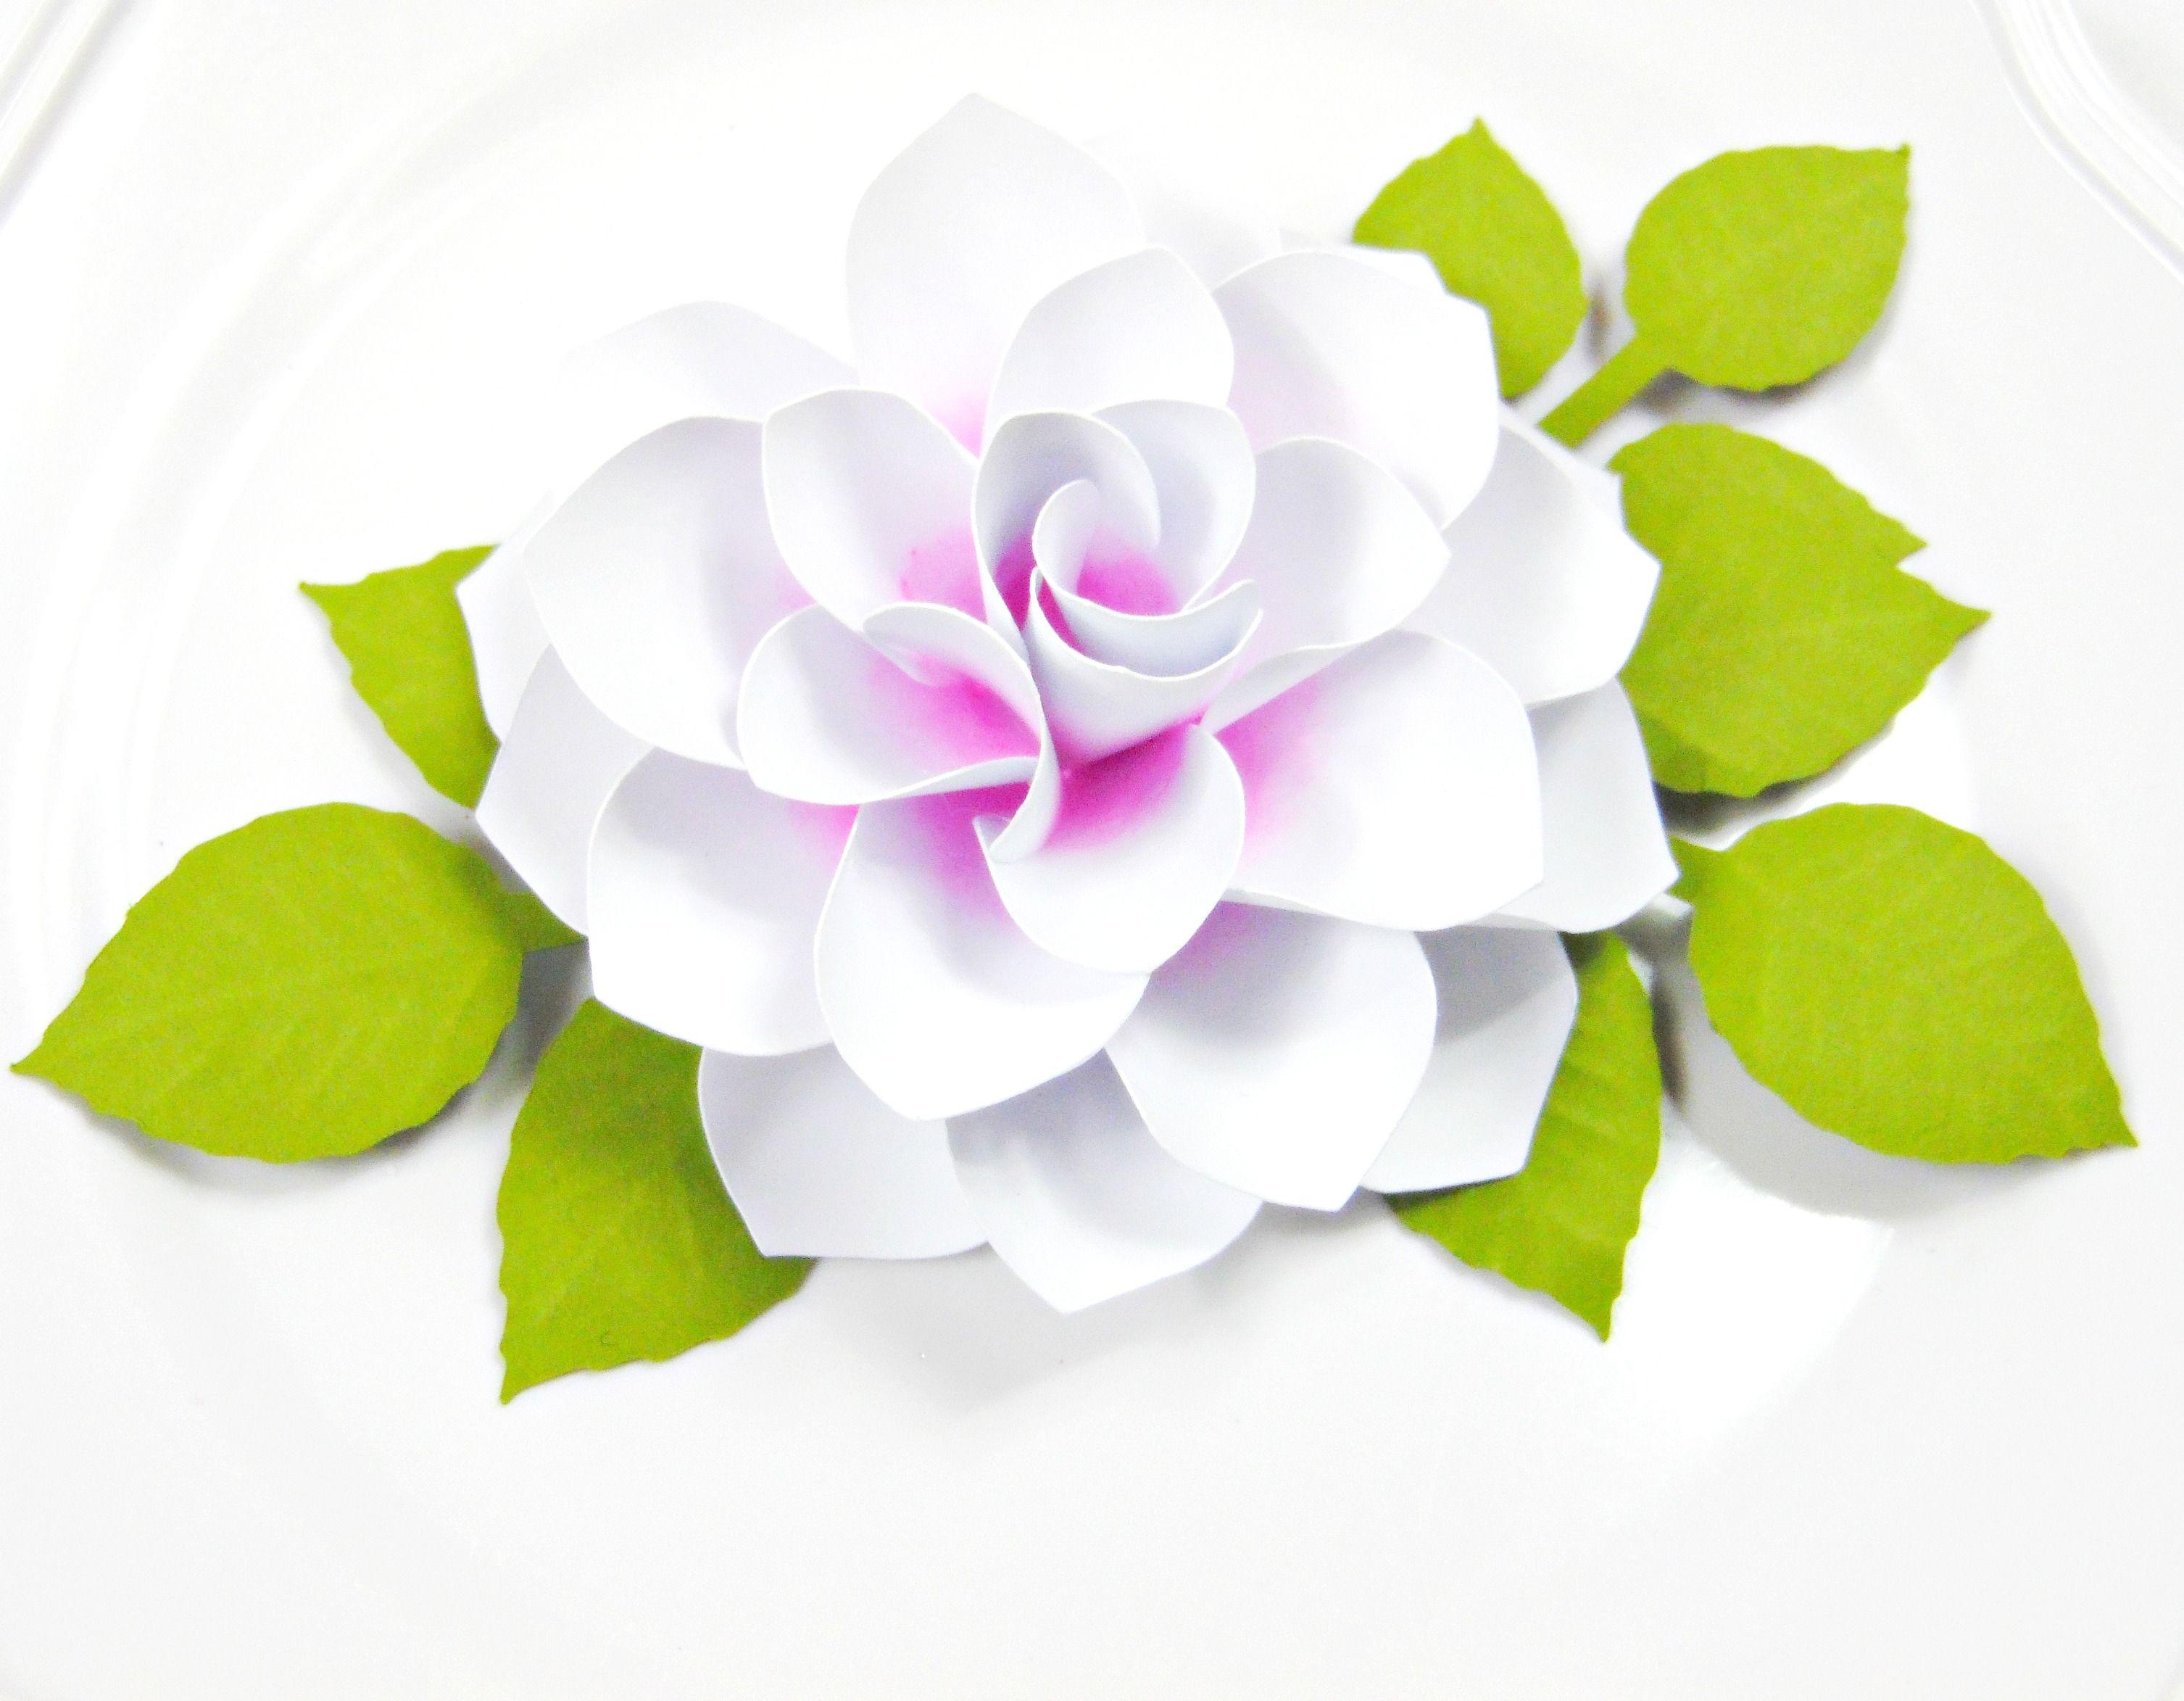 Lily style flower templates diy paper paper crafting and template lily style flower templates lilies flowersdiy flowerspaper mightylinksfo